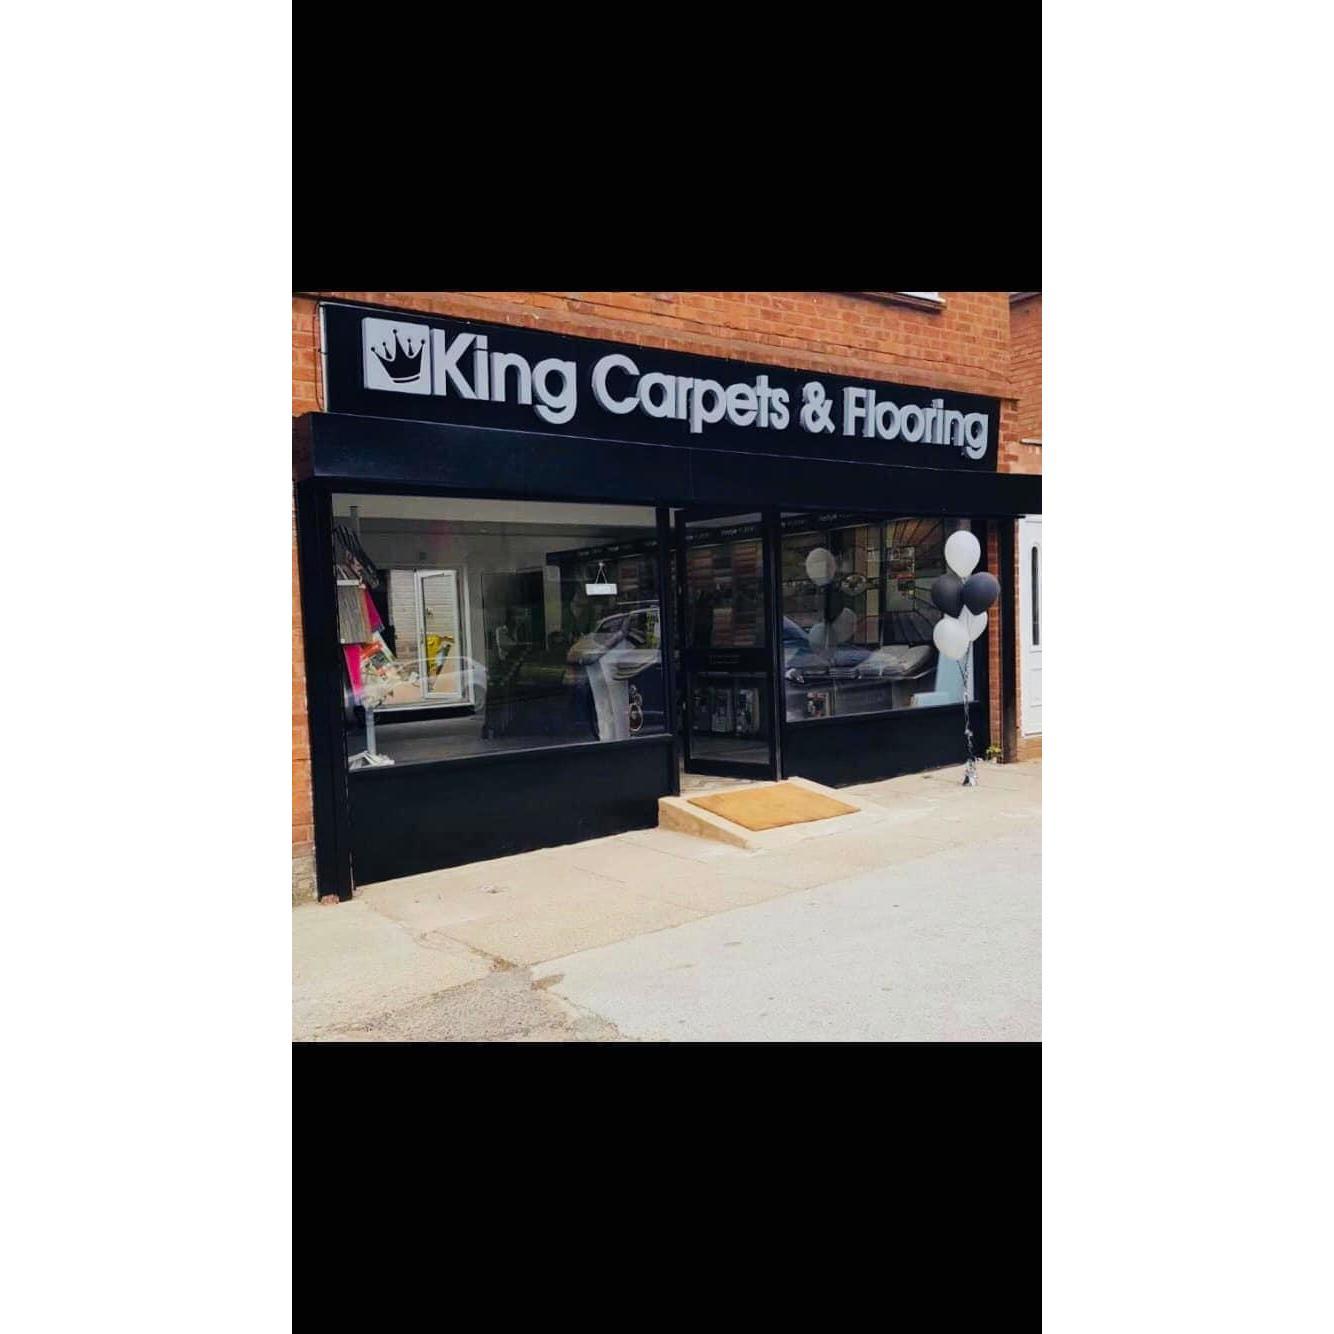 King Carpets & Flooring - Redditch, Worcestershire B97 5LD - 07736 845436 | ShowMeLocal.com